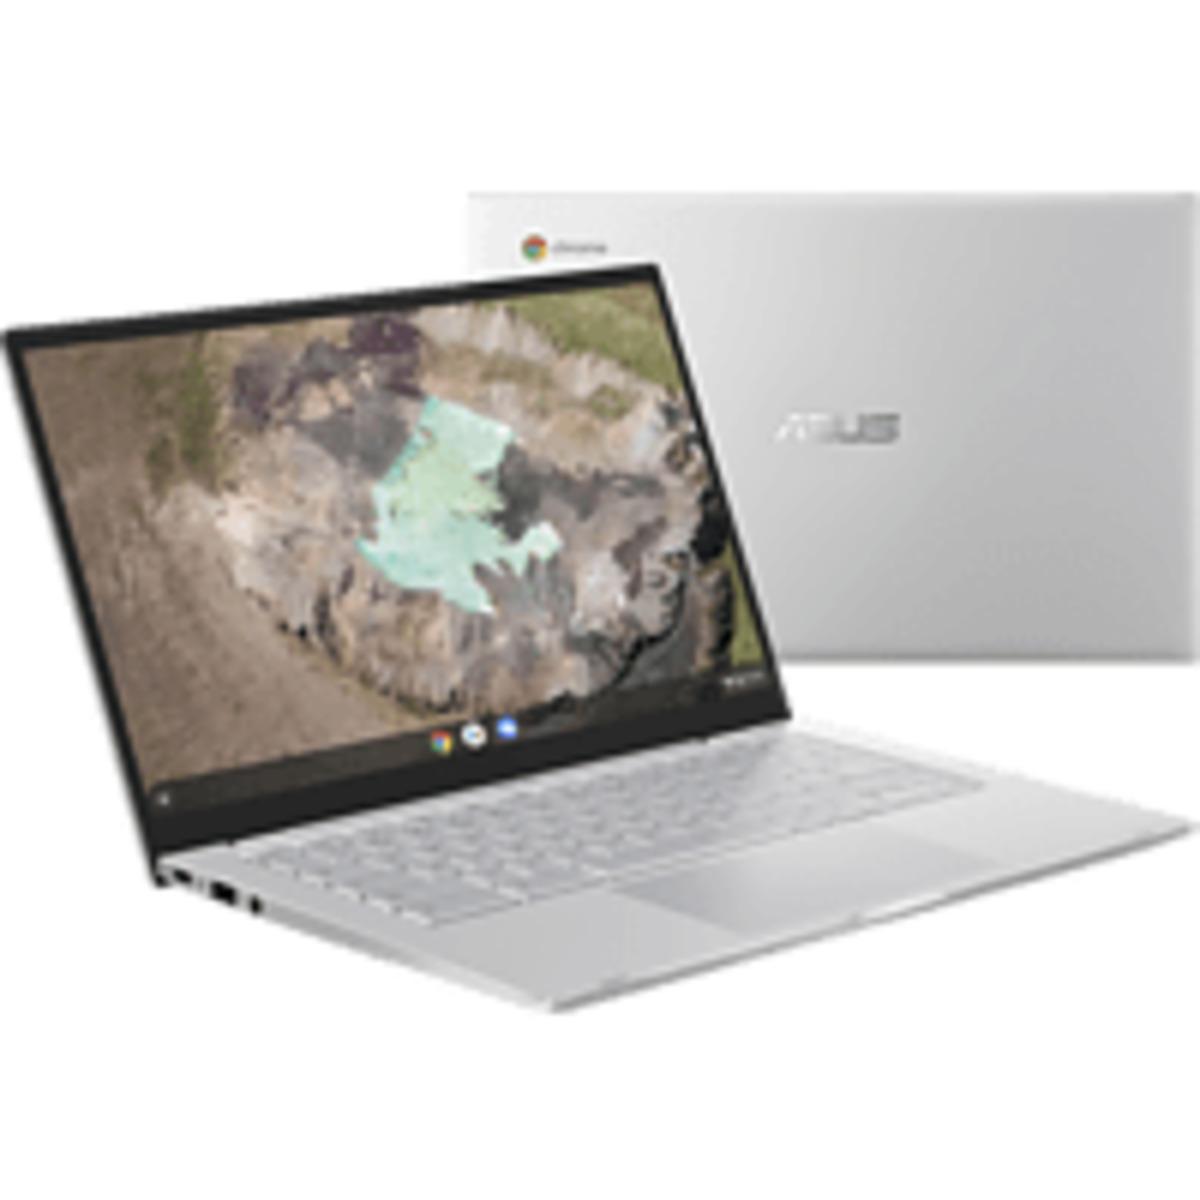 Bild 1 von ASUS C425TA-H50081, Chromebook mit 14 Zoll Display, Core™ m3 Prozessor, 8 GB RAM, 64 eMMC, Intel® HD Grafik 615, Silver